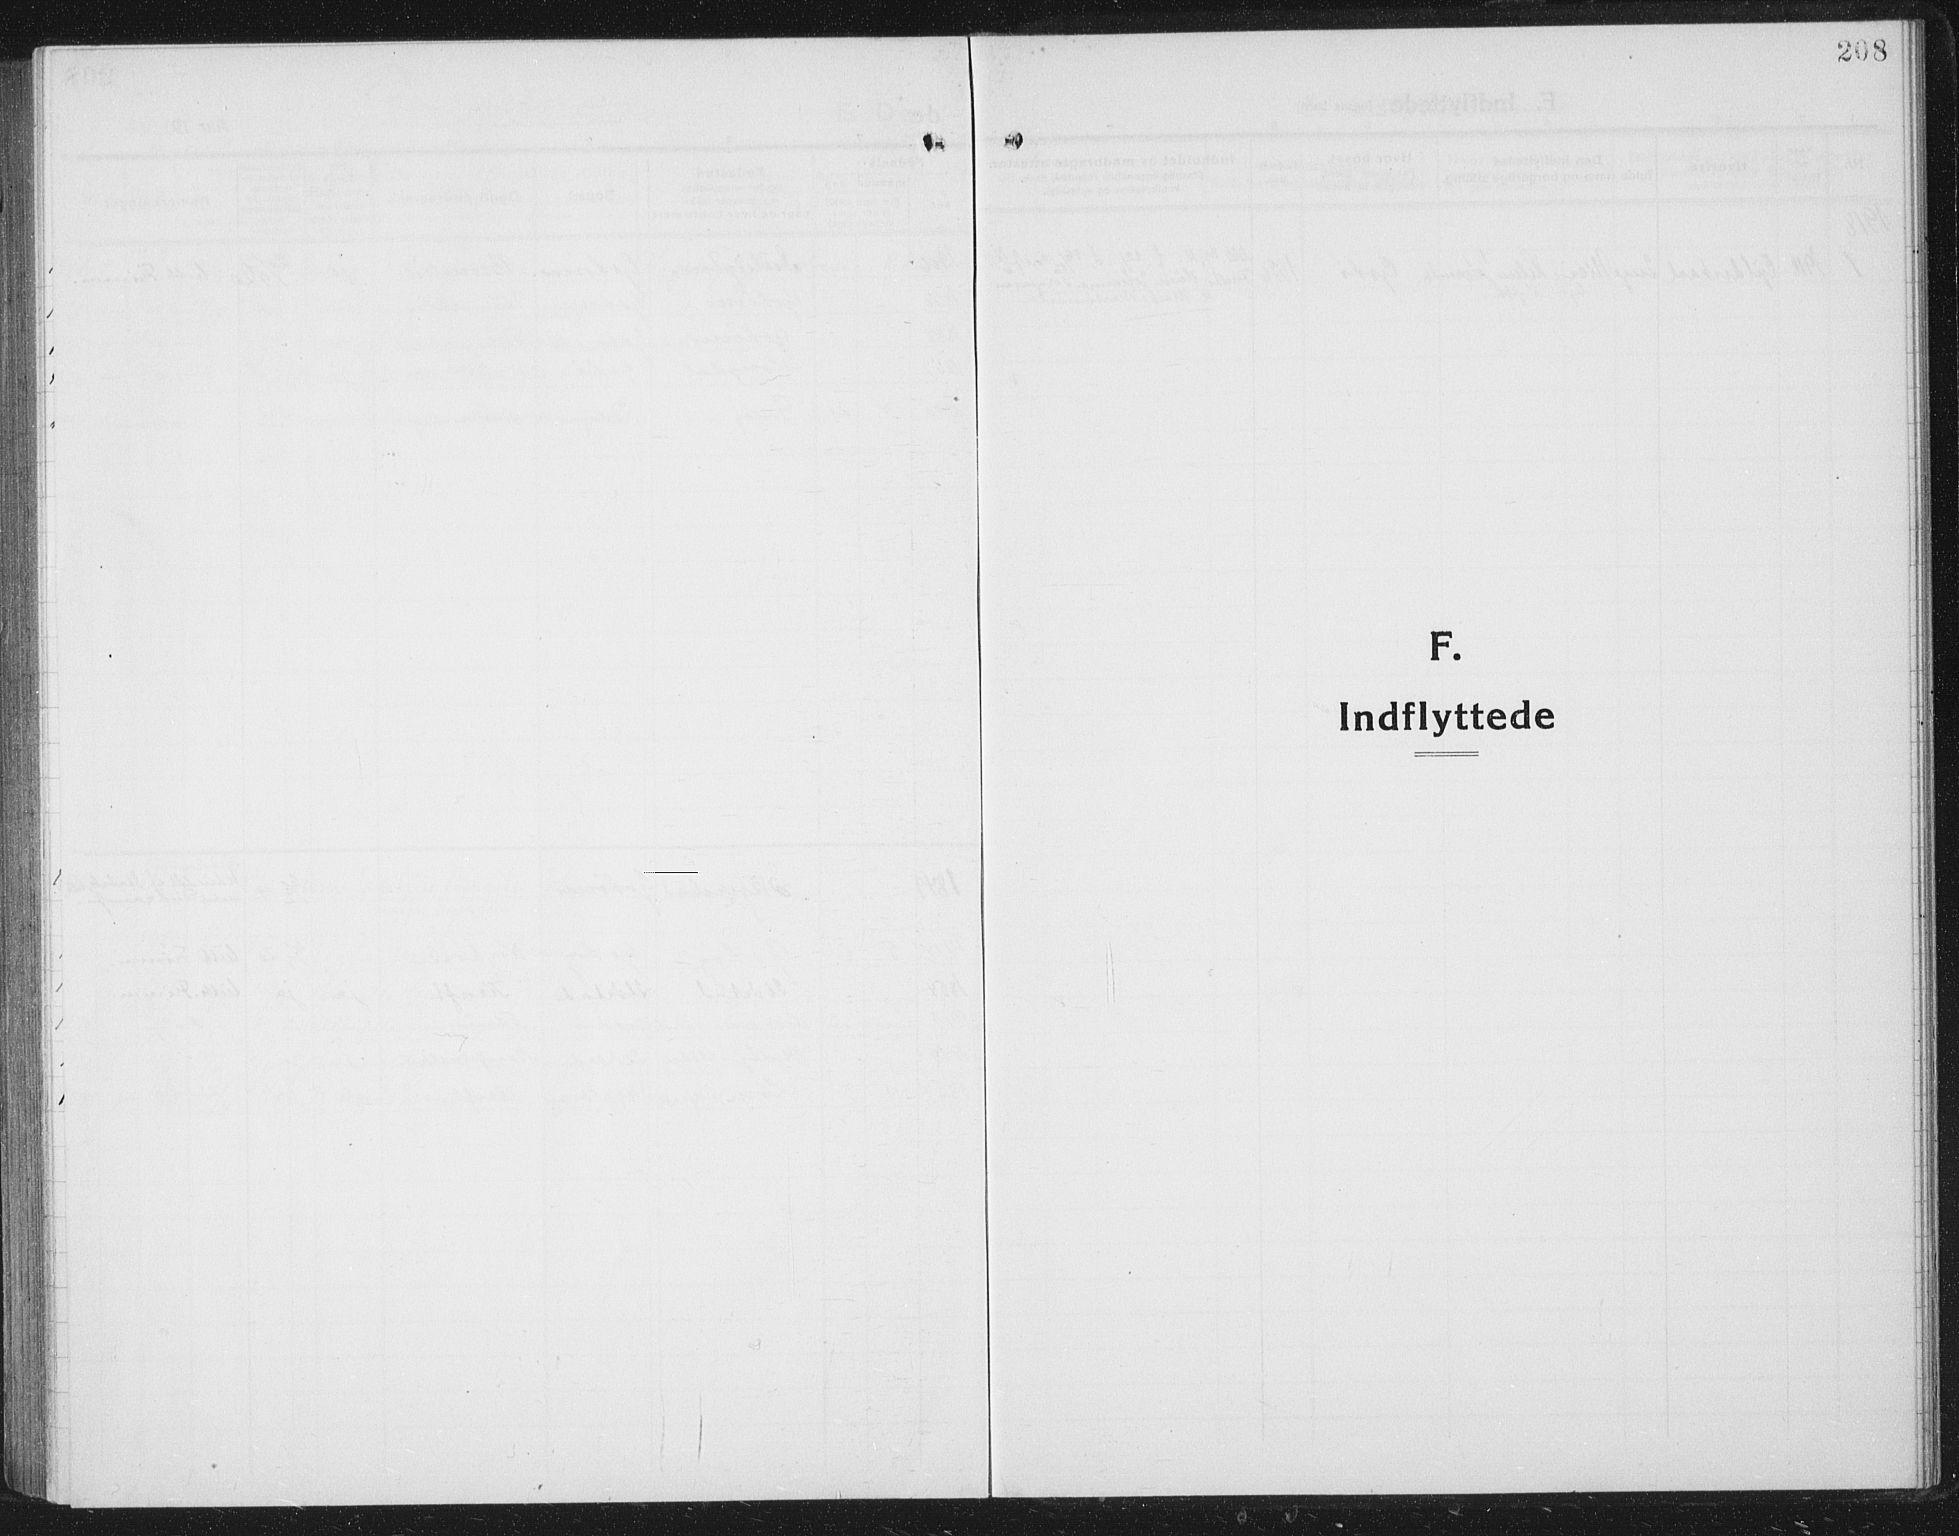 SAT, Ministerialprotokoller, klokkerbøker og fødselsregistre - Nordland, 804/L0089: Klokkerbok nr. 804C02, 1918-1935, s. 208